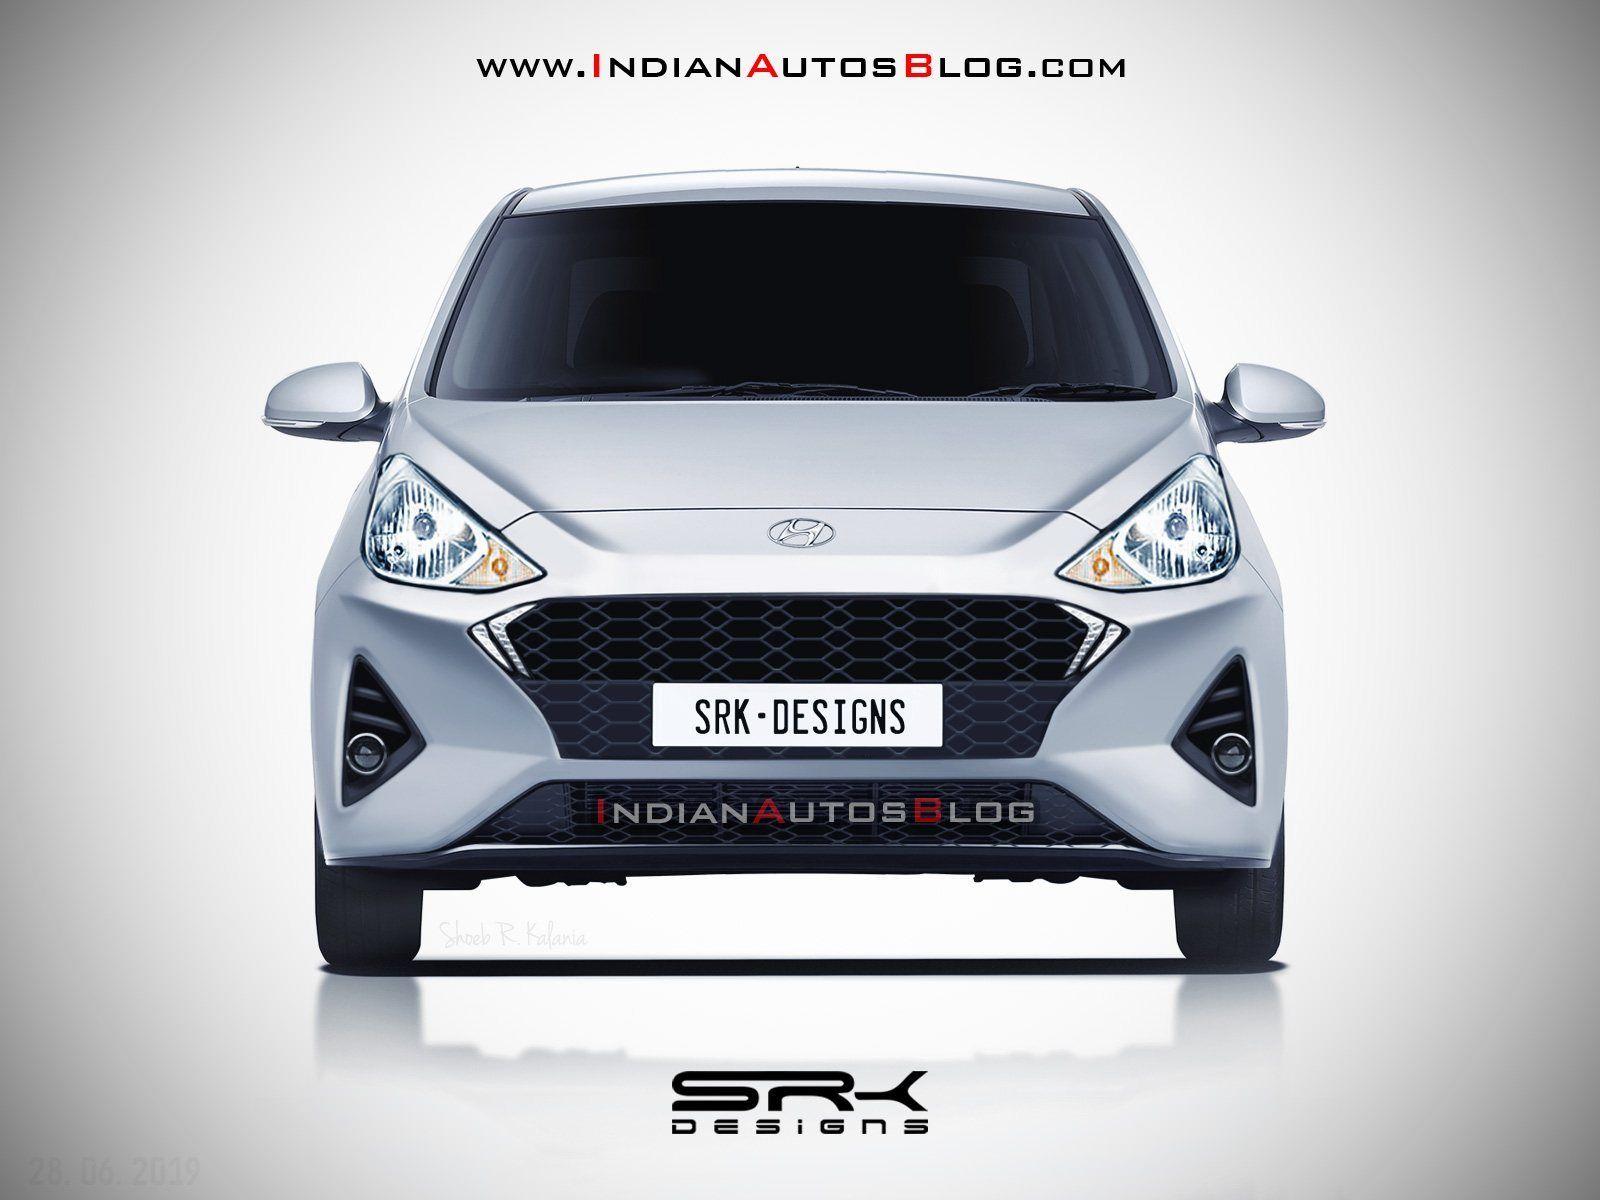 2020 Hyundai I20 Specs And Review In 2020 Sedan Hyundai New Hyundai